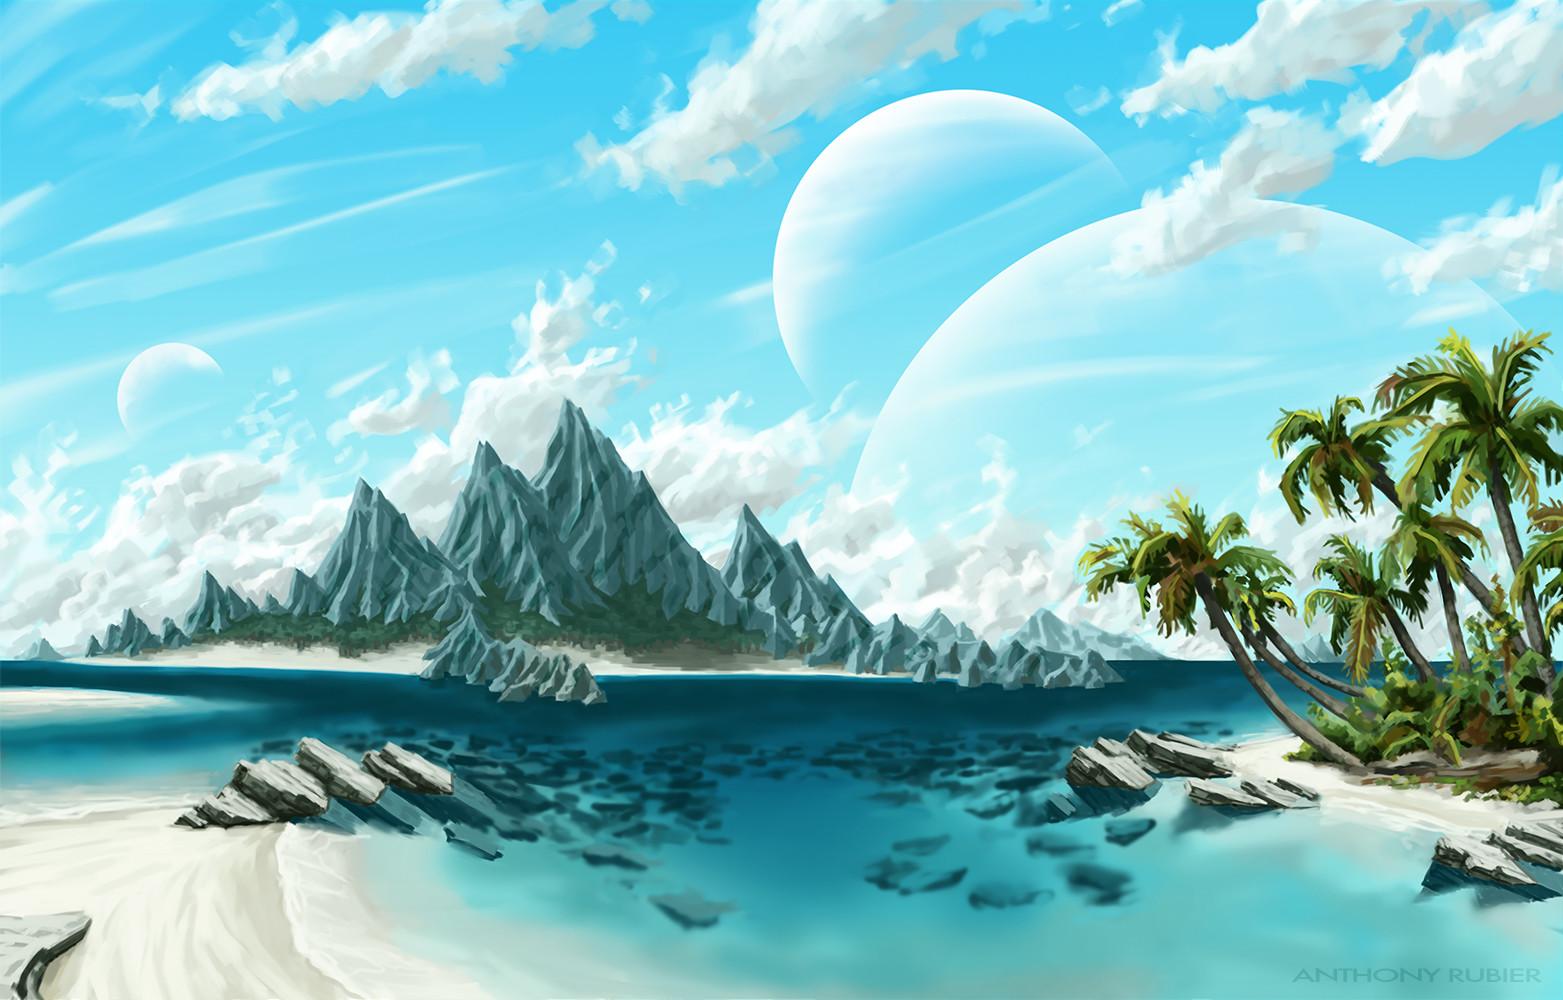 Anthony rubier peinture land archipel2